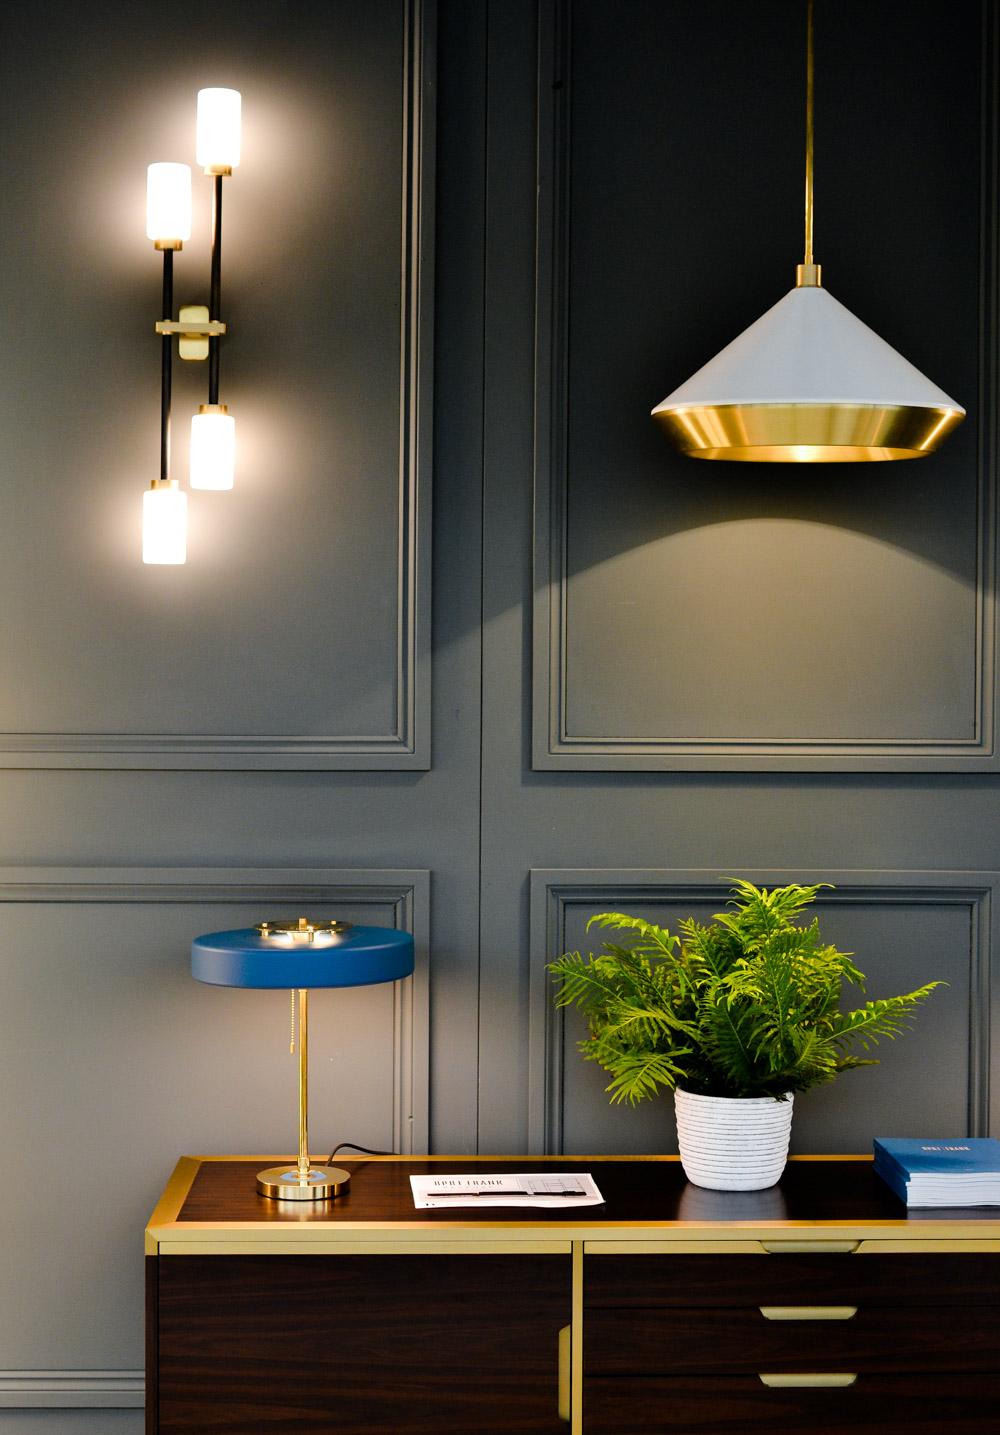 2017 Interior Design Home Decor Trend Report Mixed Metal Lighting Via Bert Frank Emmerson And Fifteenth